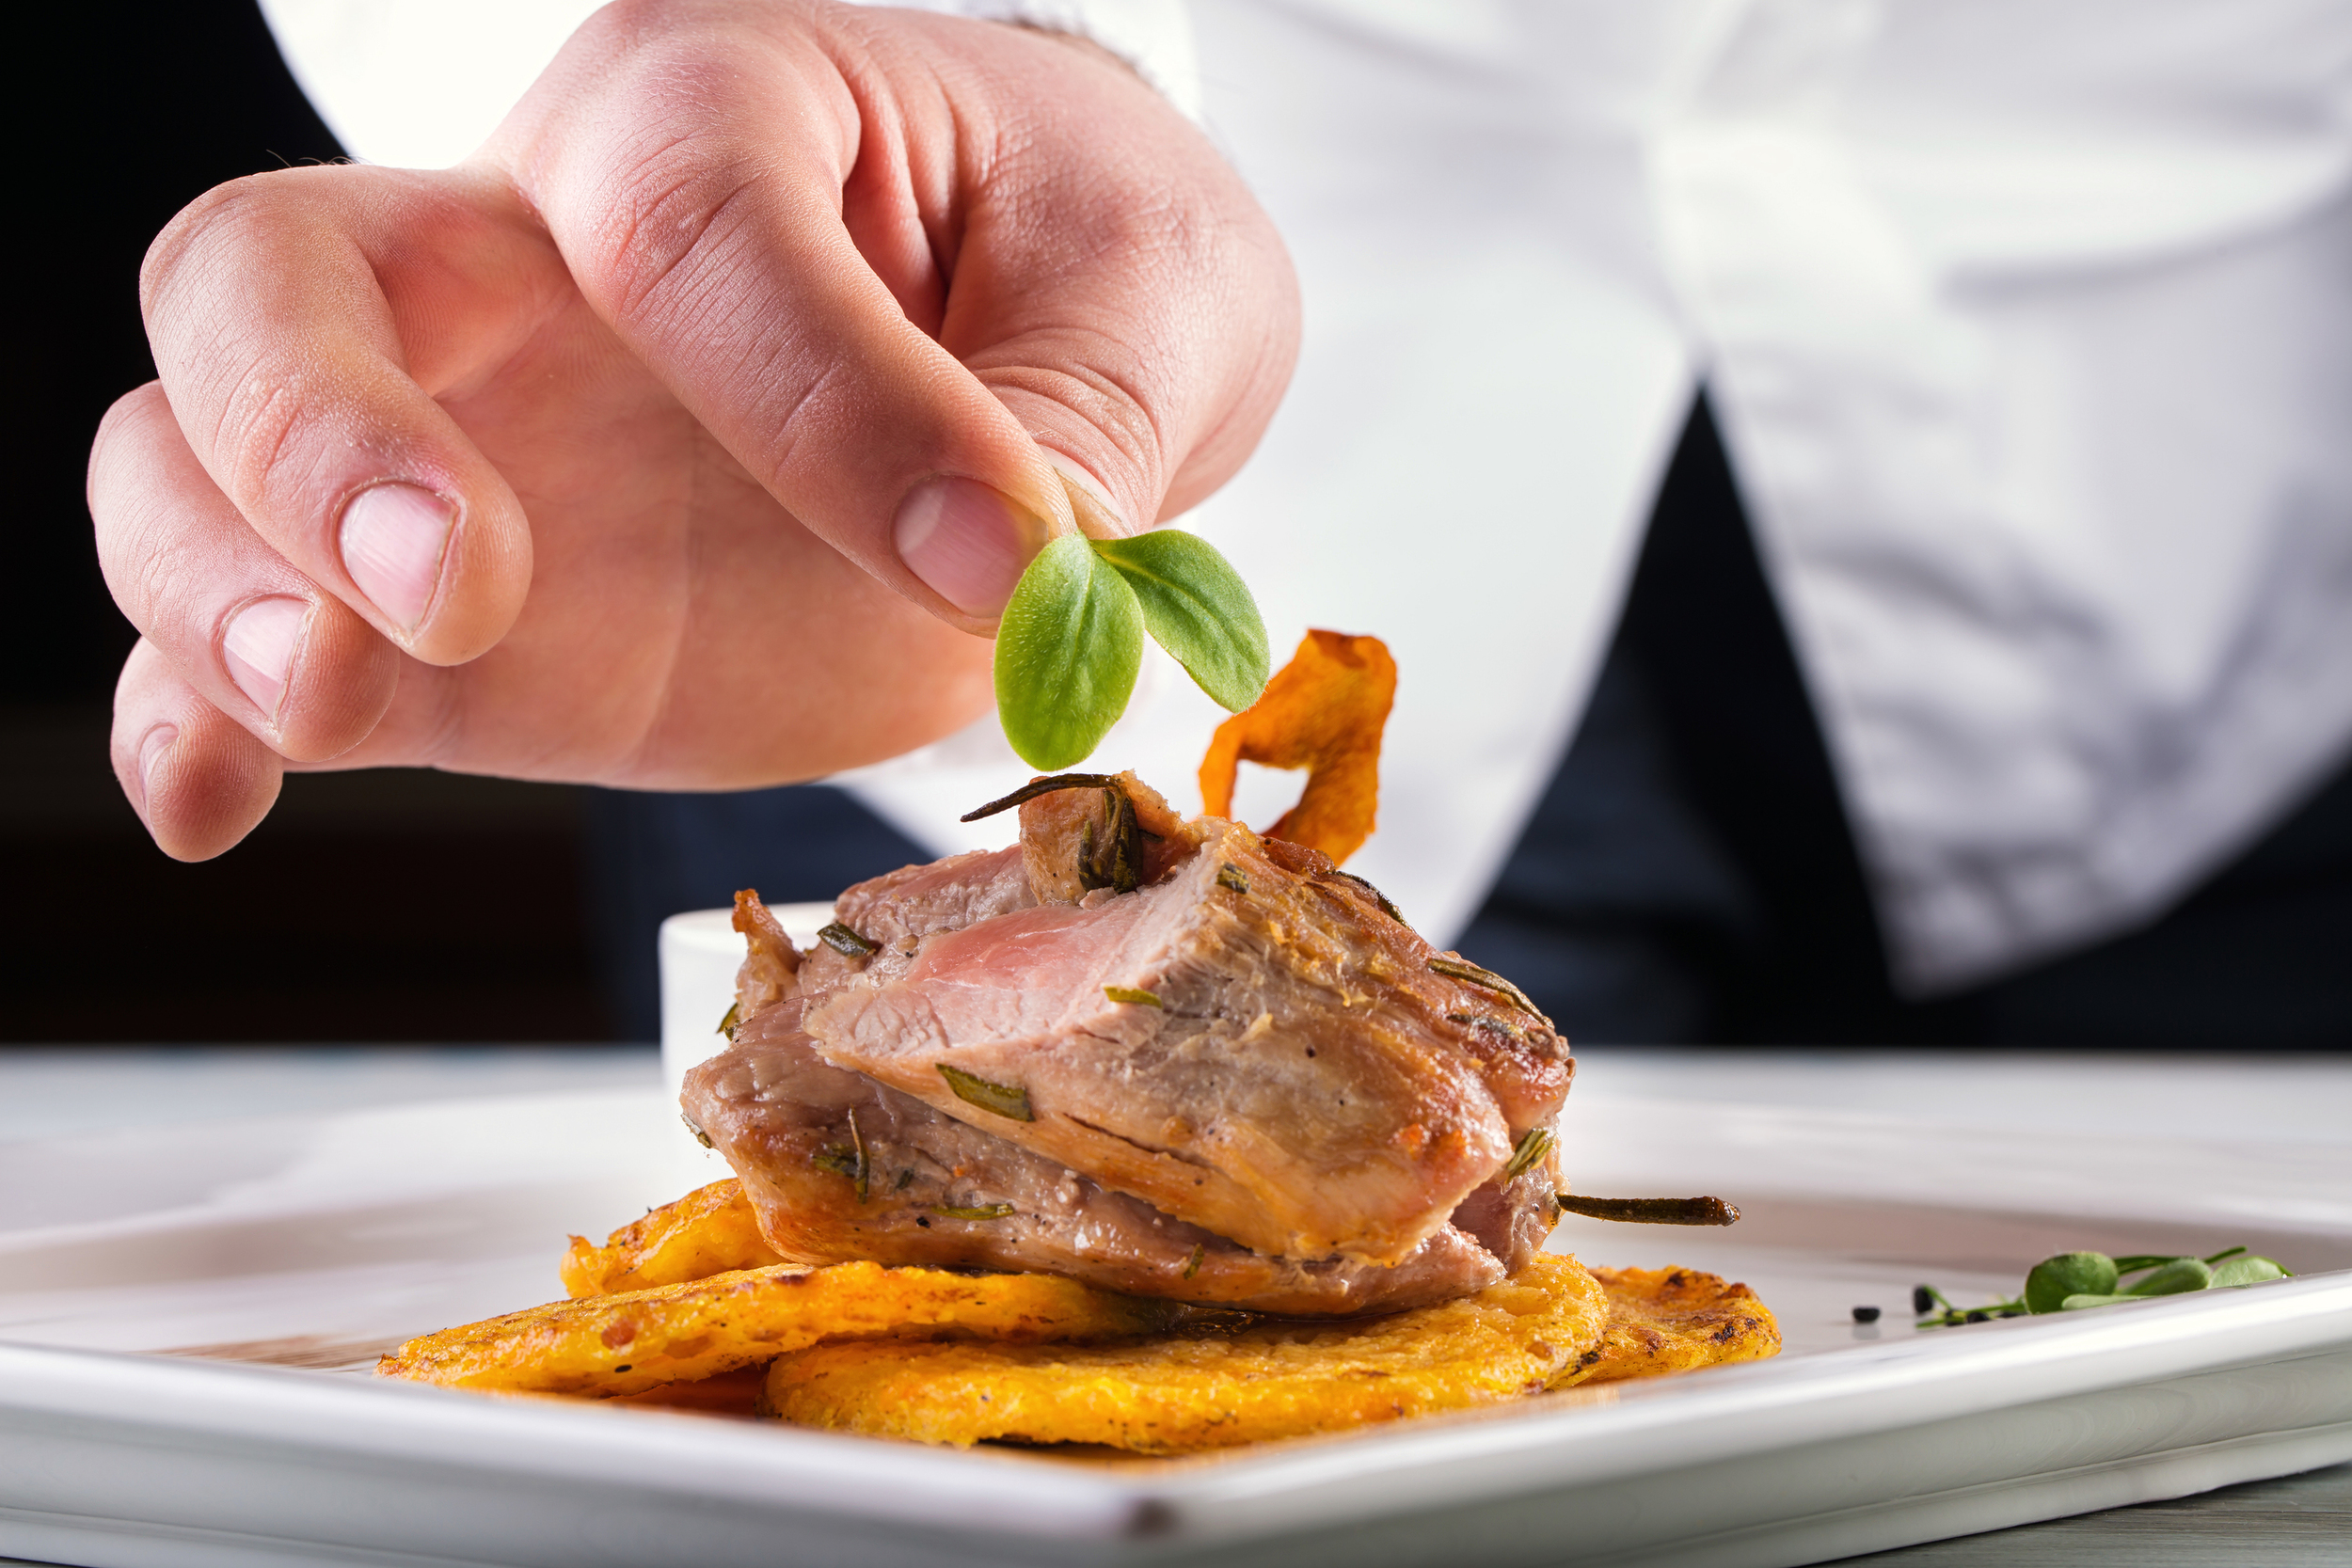 Chef Hand